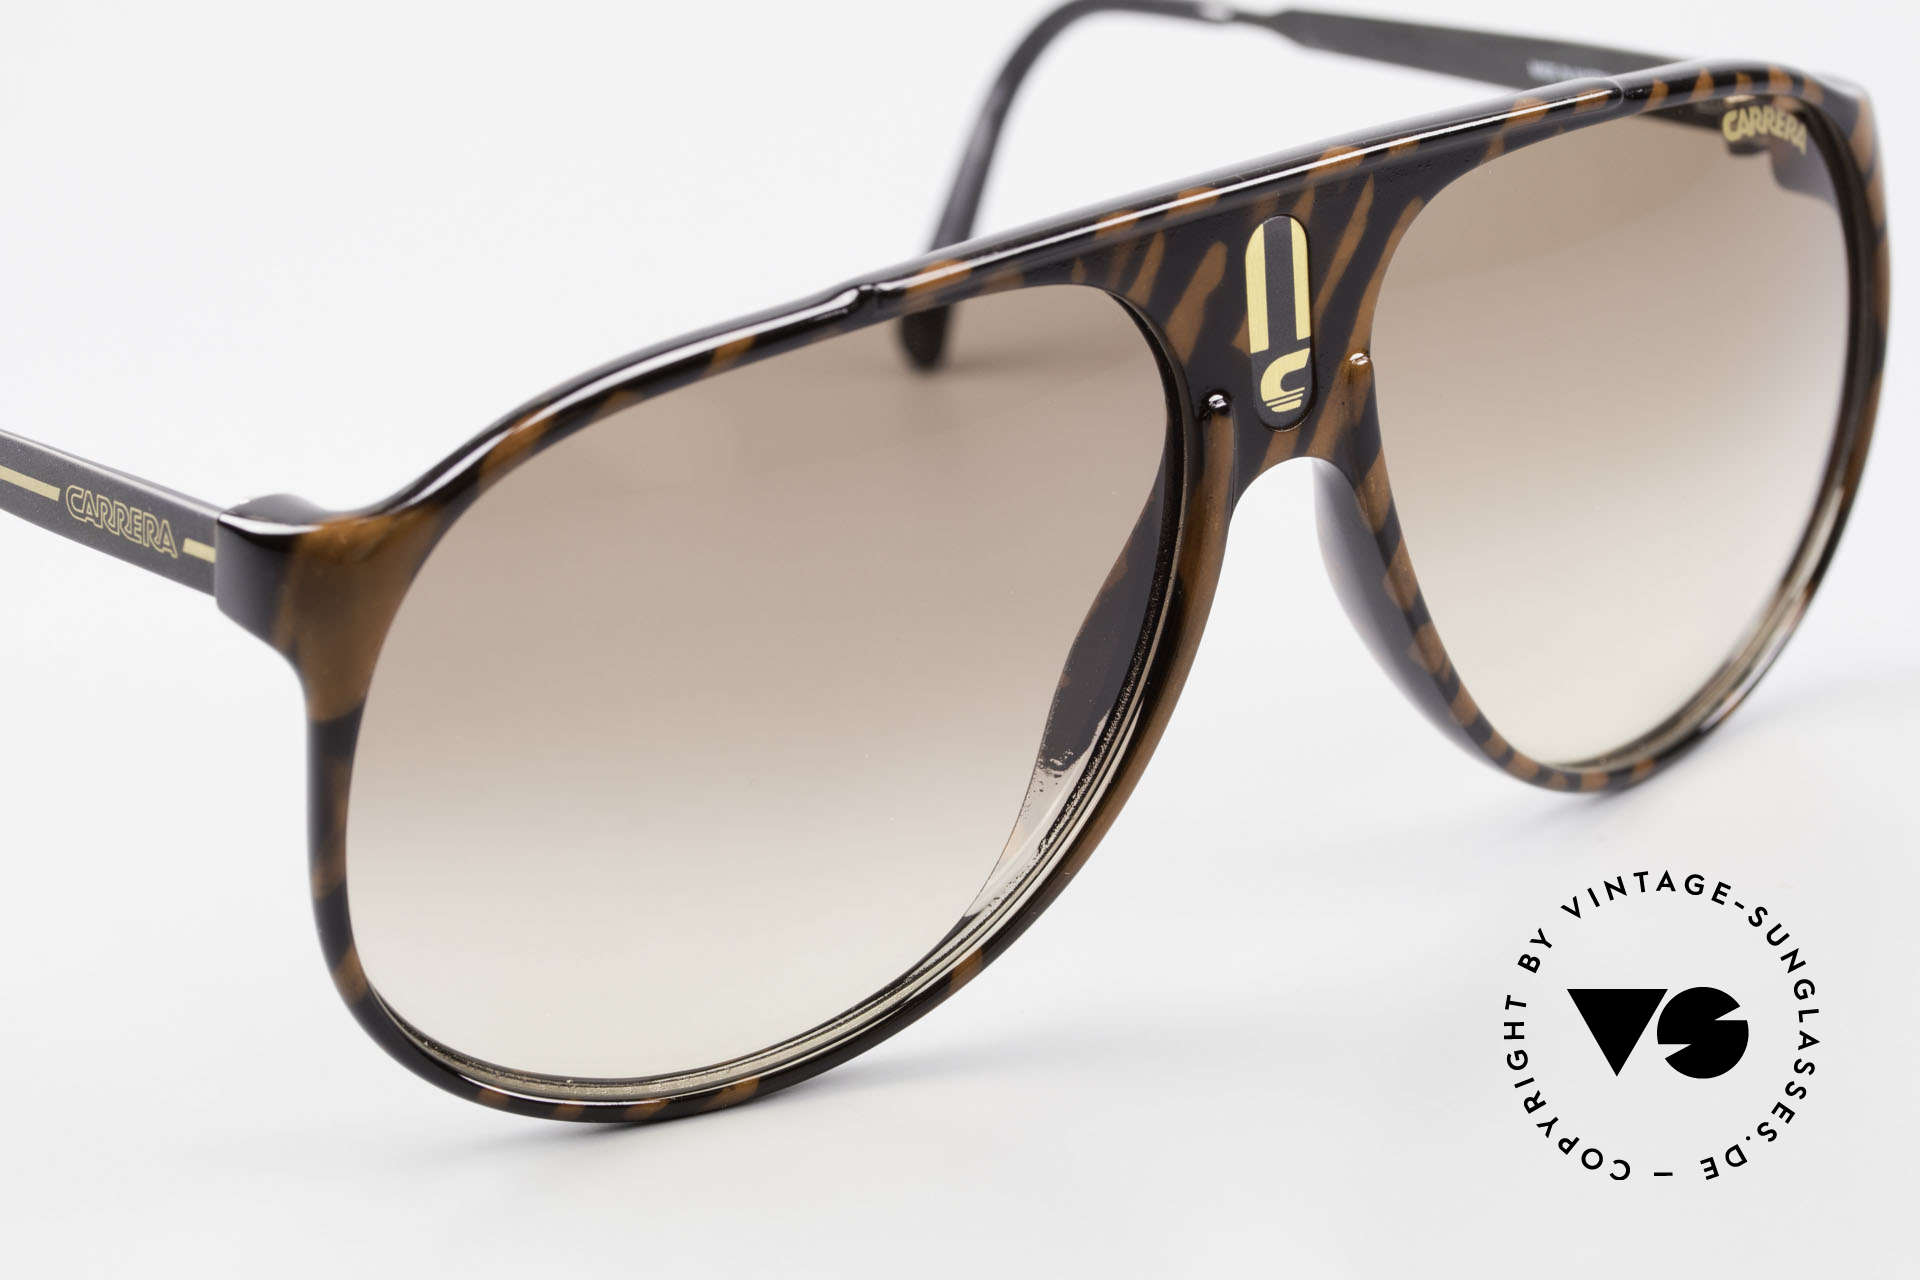 Carrera 5424 Aviator Sports Sunglasses 80's, brilliant pattern (like a kind of precious wood optic), Made for Men